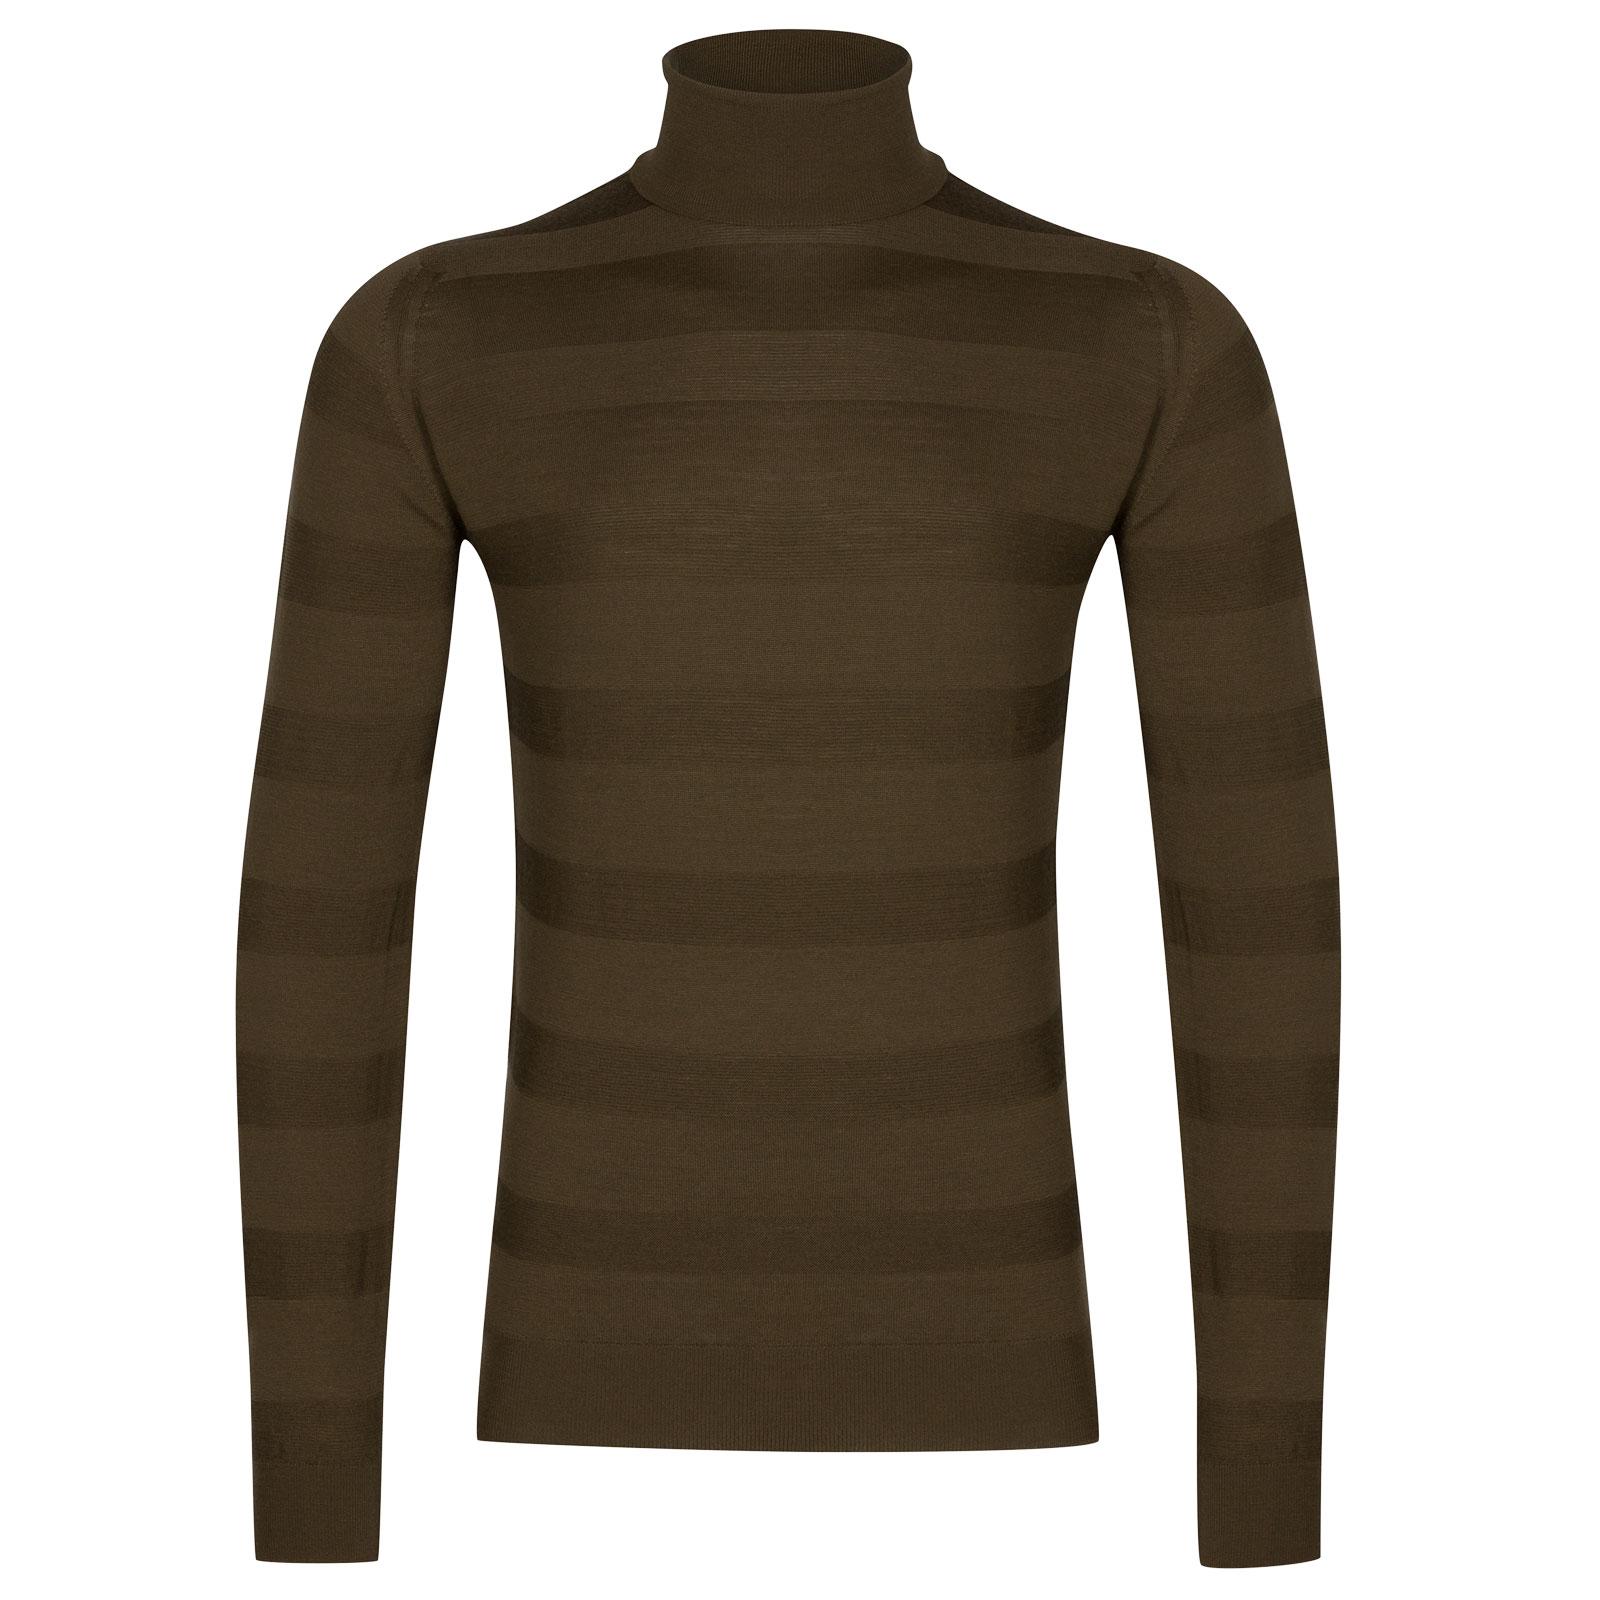 John Smedley ripley Merino Wool Pullover in Kielder Green-XL